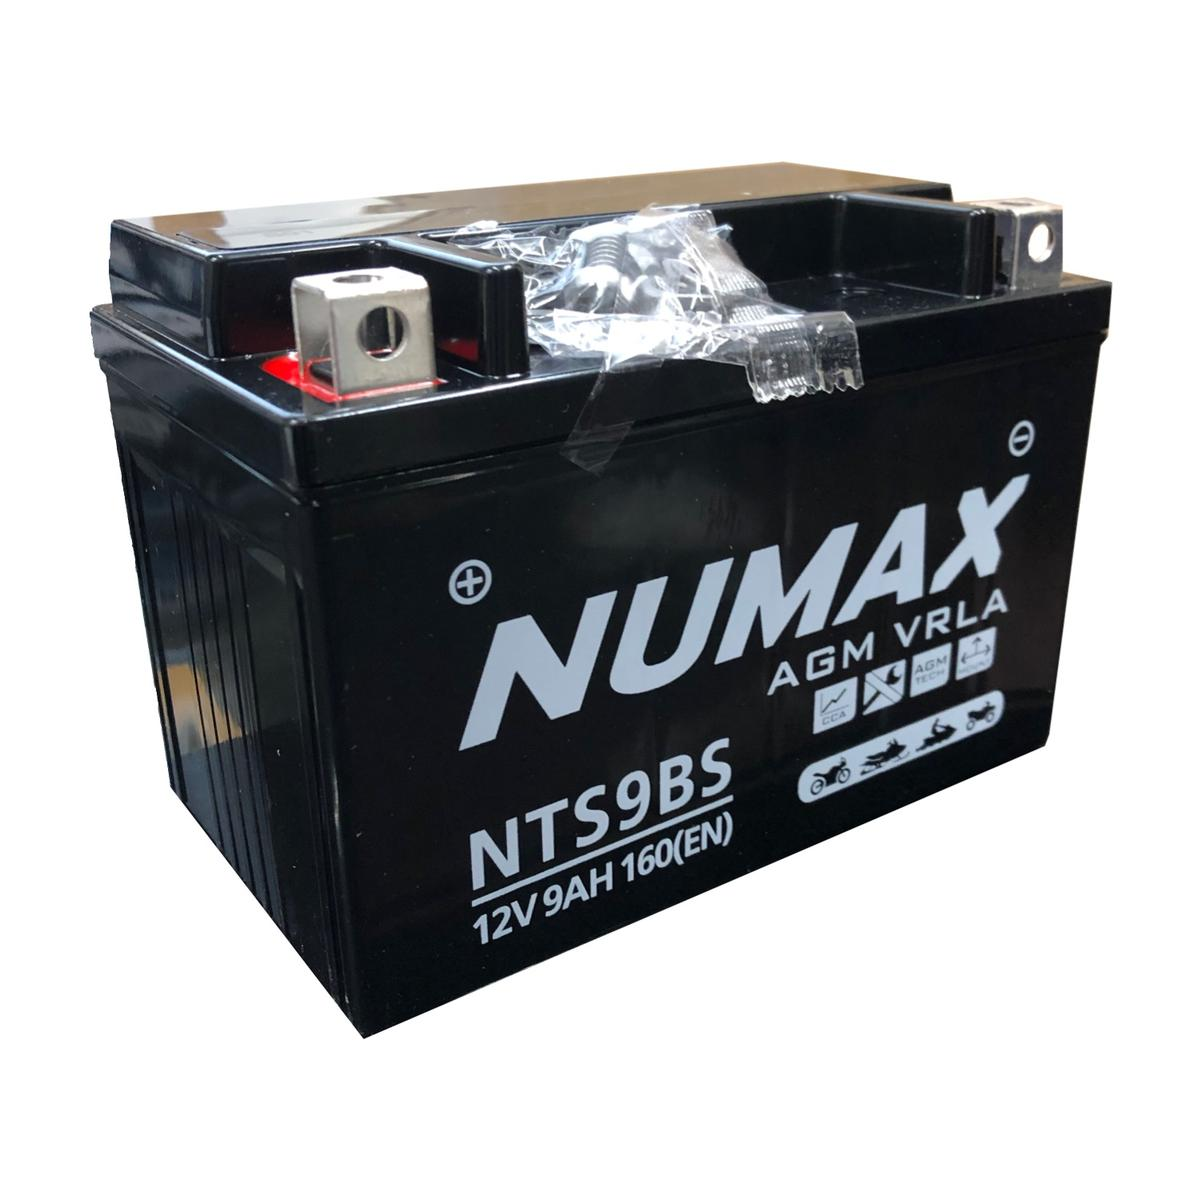 Numax NTS9BS 12v Motorbike Bike Battery KYMCO 150cc Heroism YXT9-4